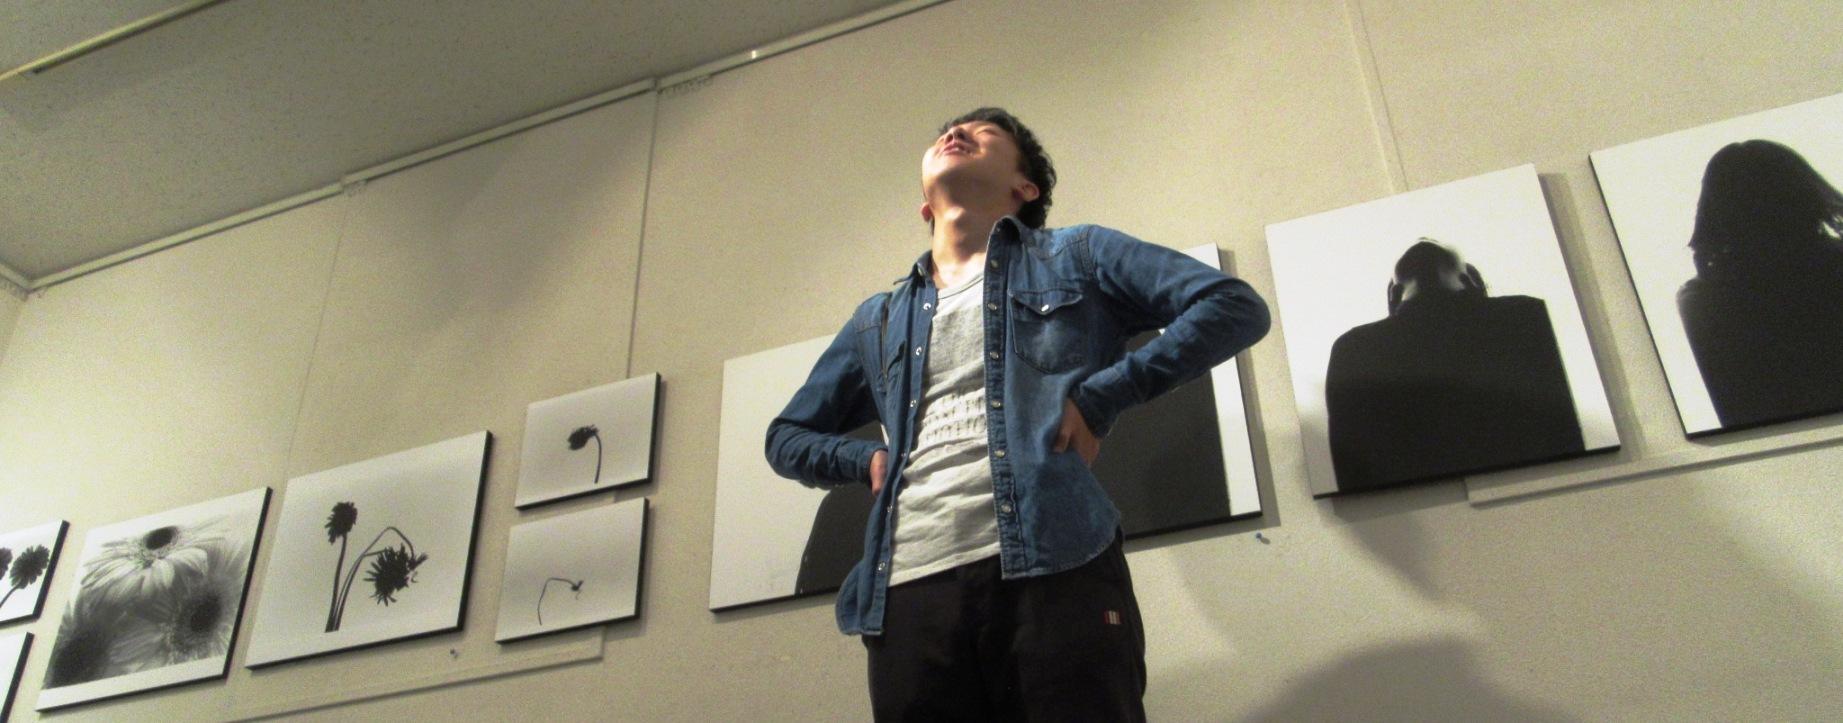 2570)③「『moment』 篠原 奈那子(藤女子大学4年)写真展」 アートスペース201 8月3日(木)~8月7日(火)_f0126829_11014925.jpg